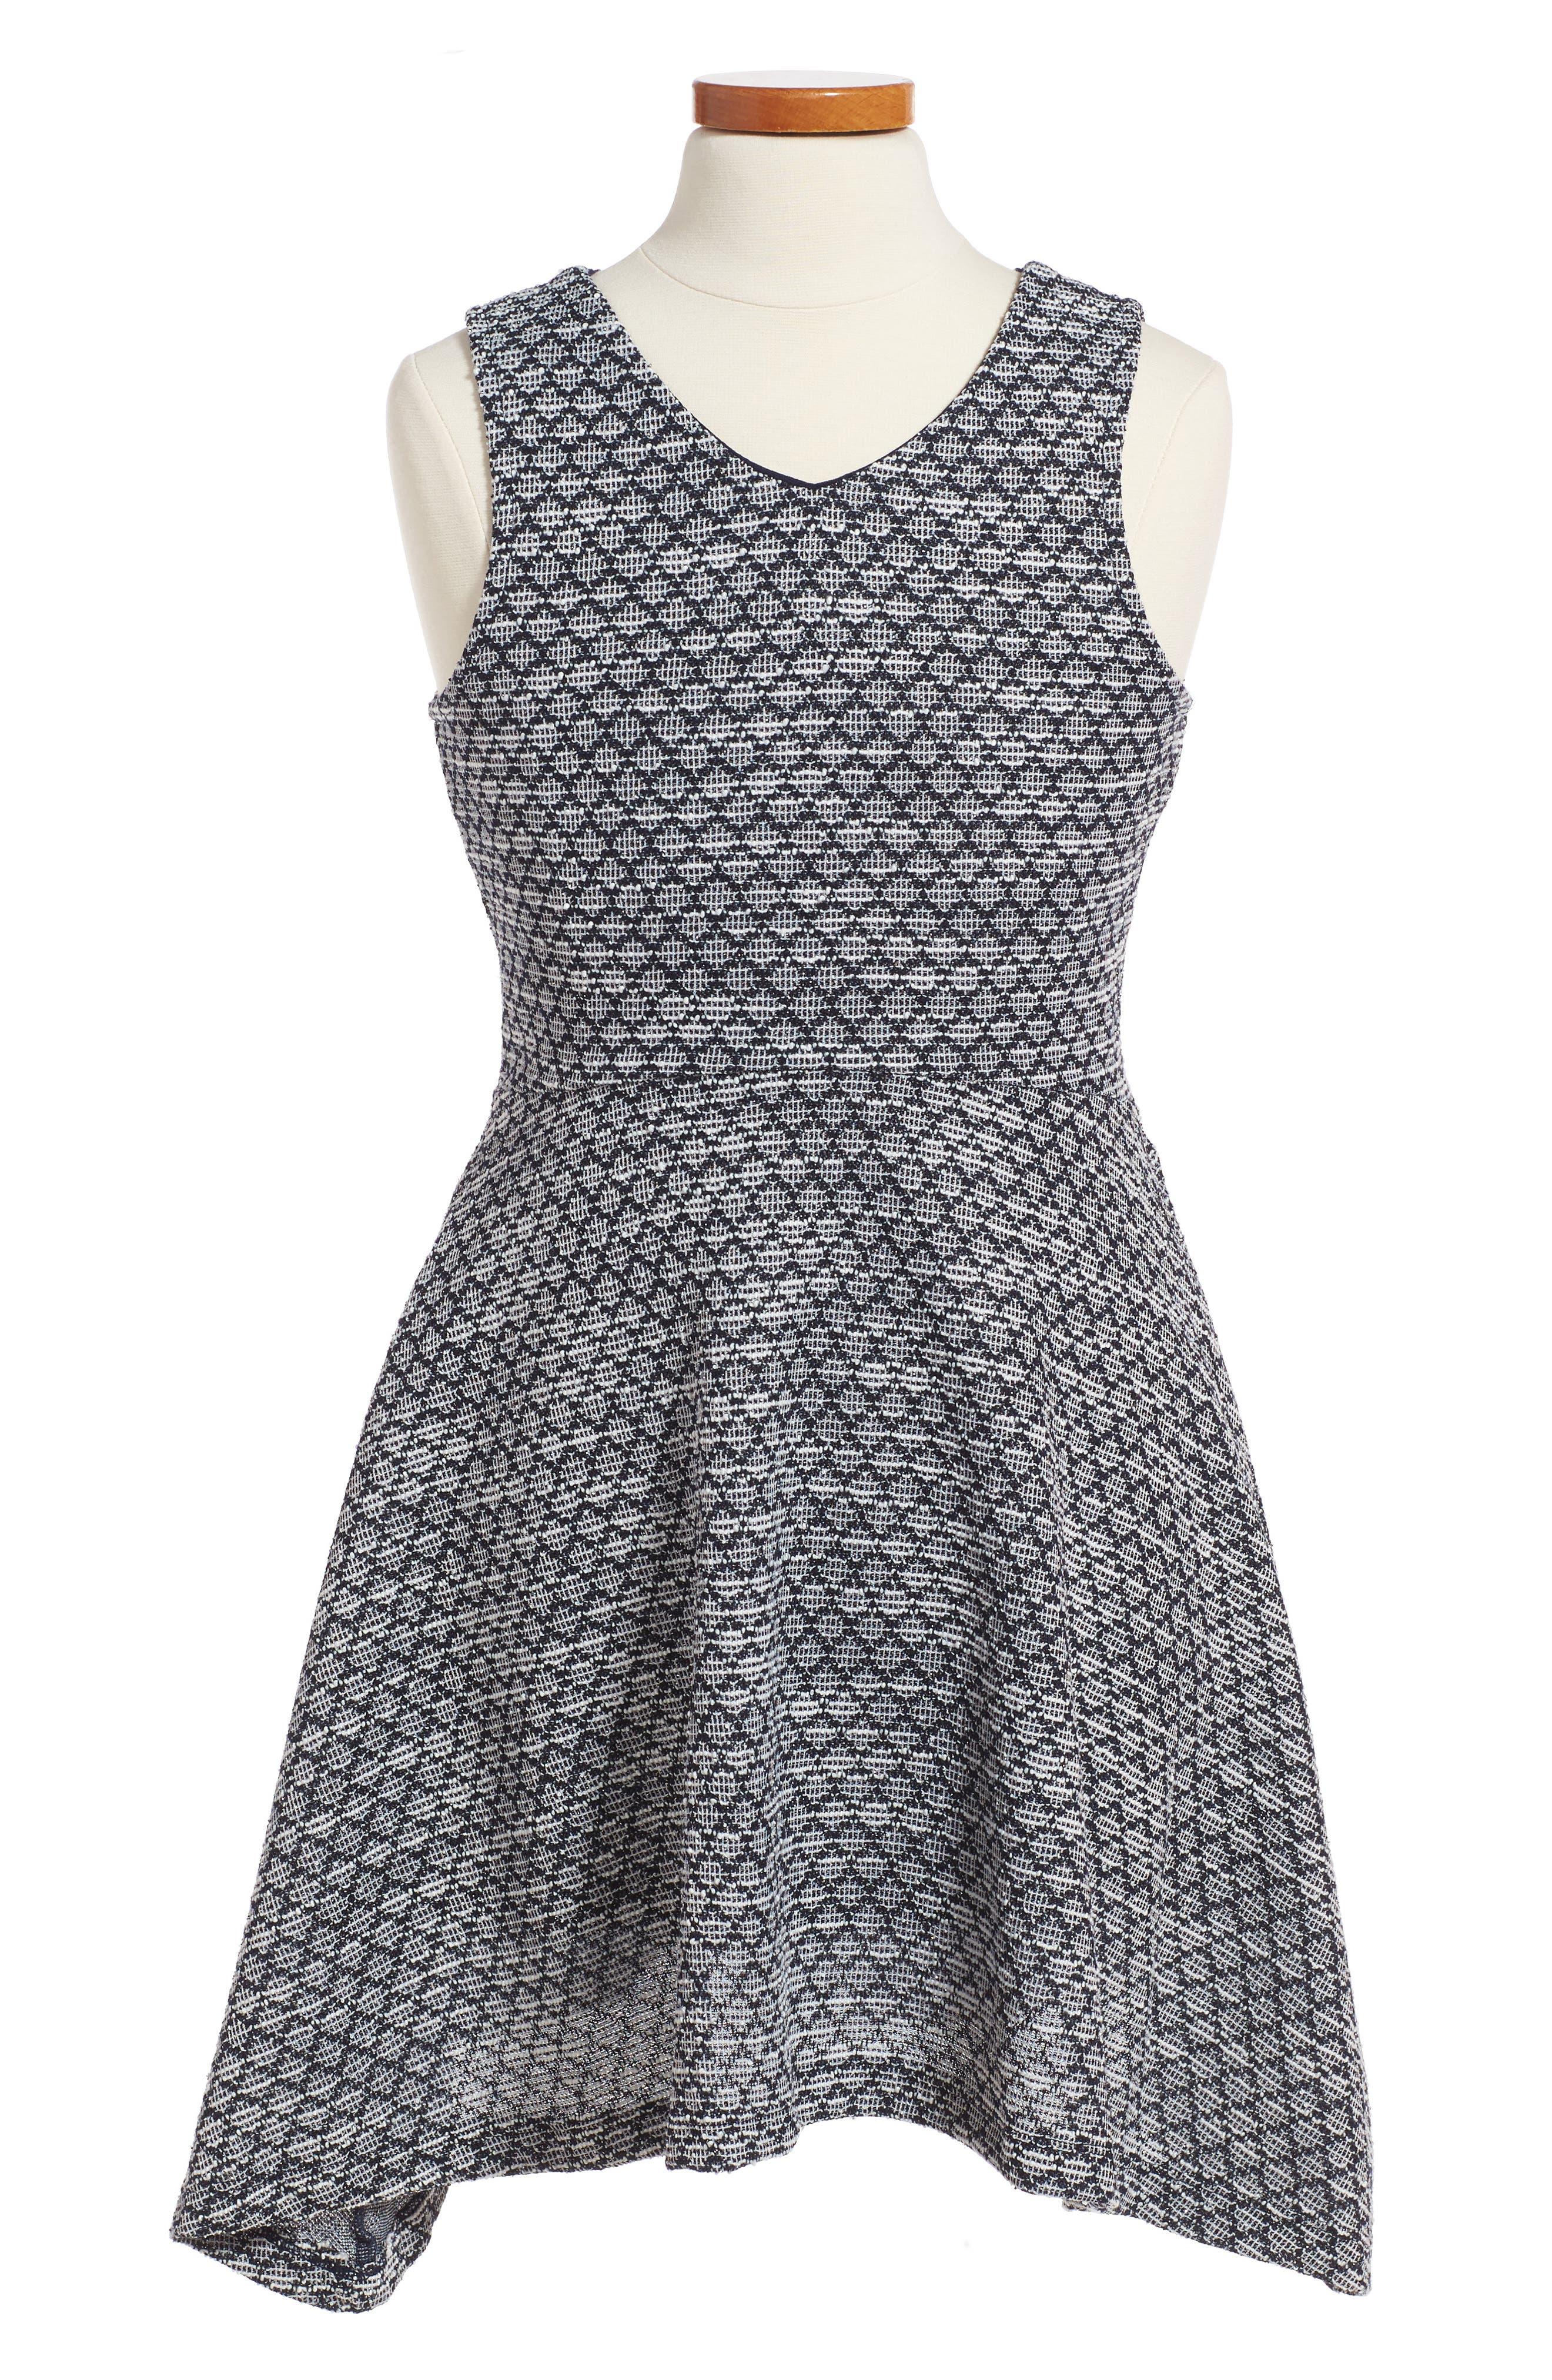 Elisa B Lolita Sleeveless Skater Dress (Big Girls)